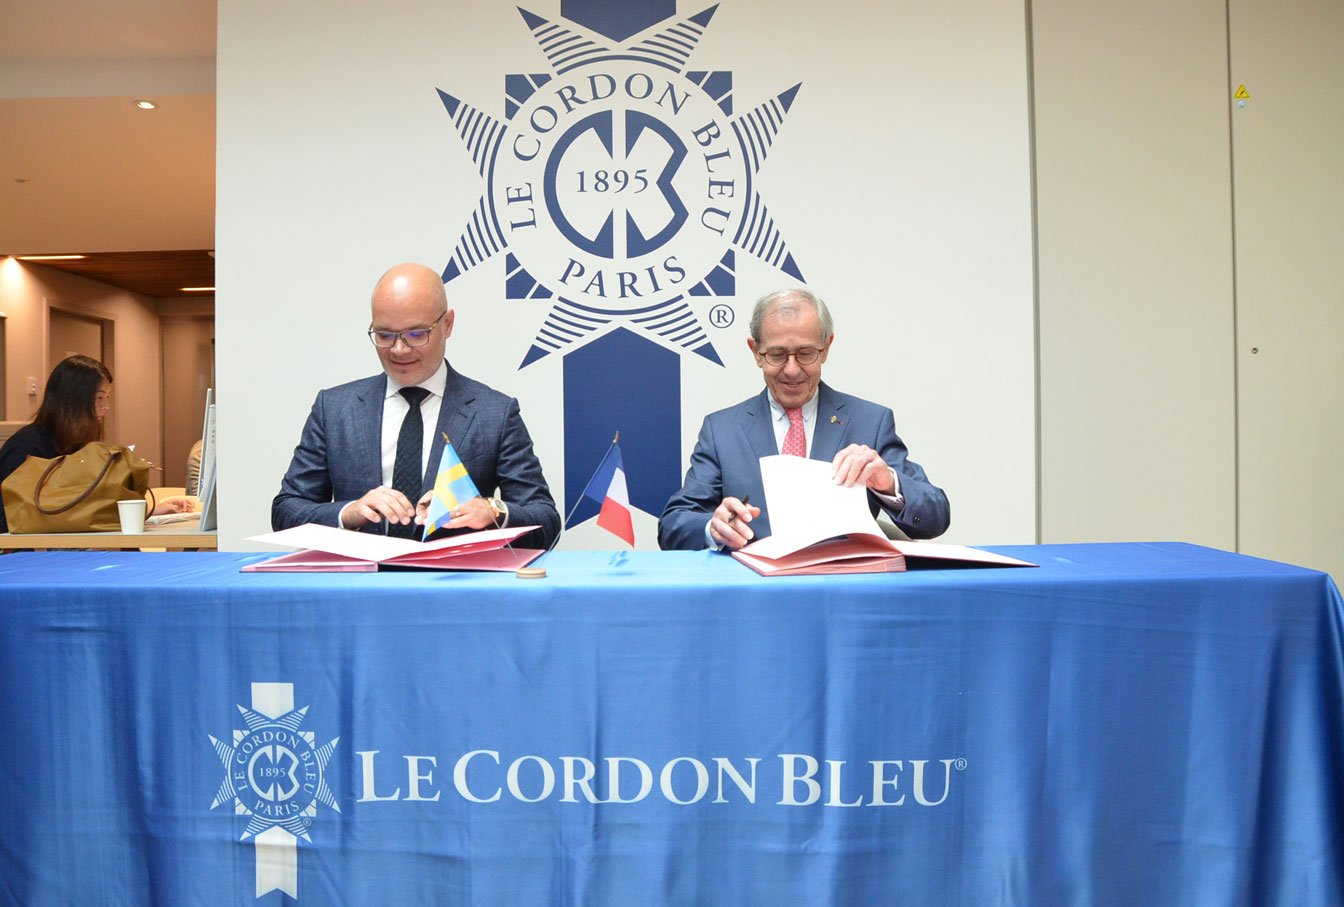 Partnership Le Cordon Bleu Electrolux